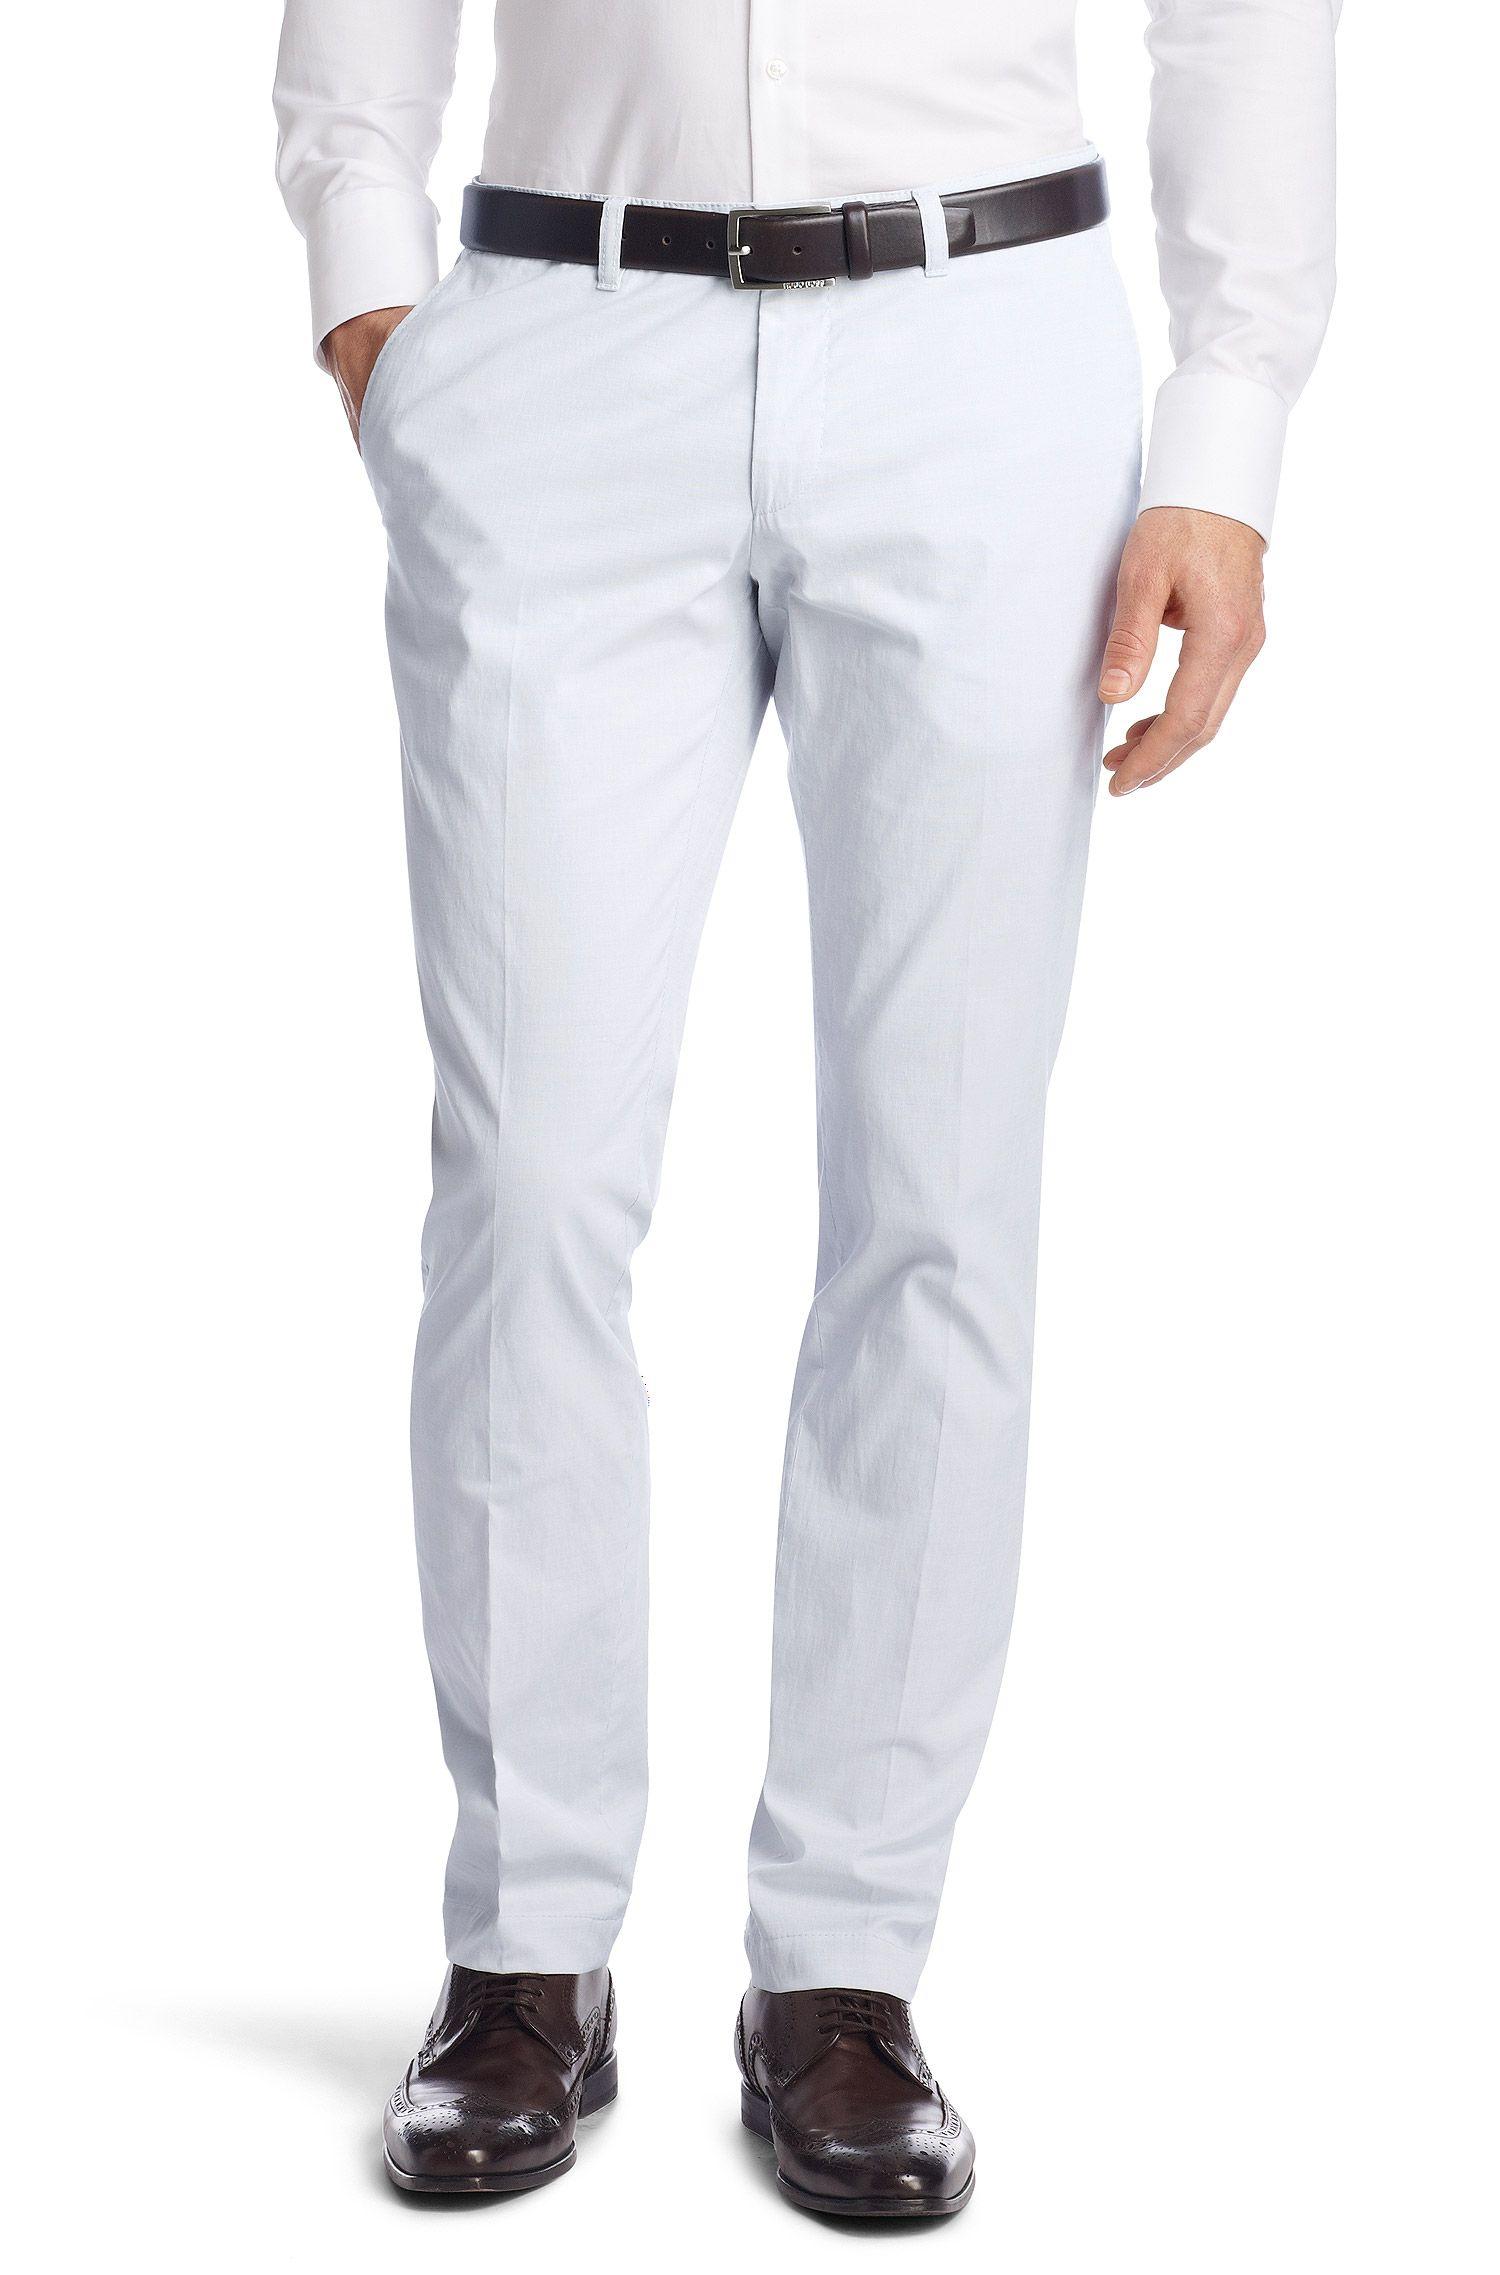 Pantalon à jambes étroites, Wing1-W